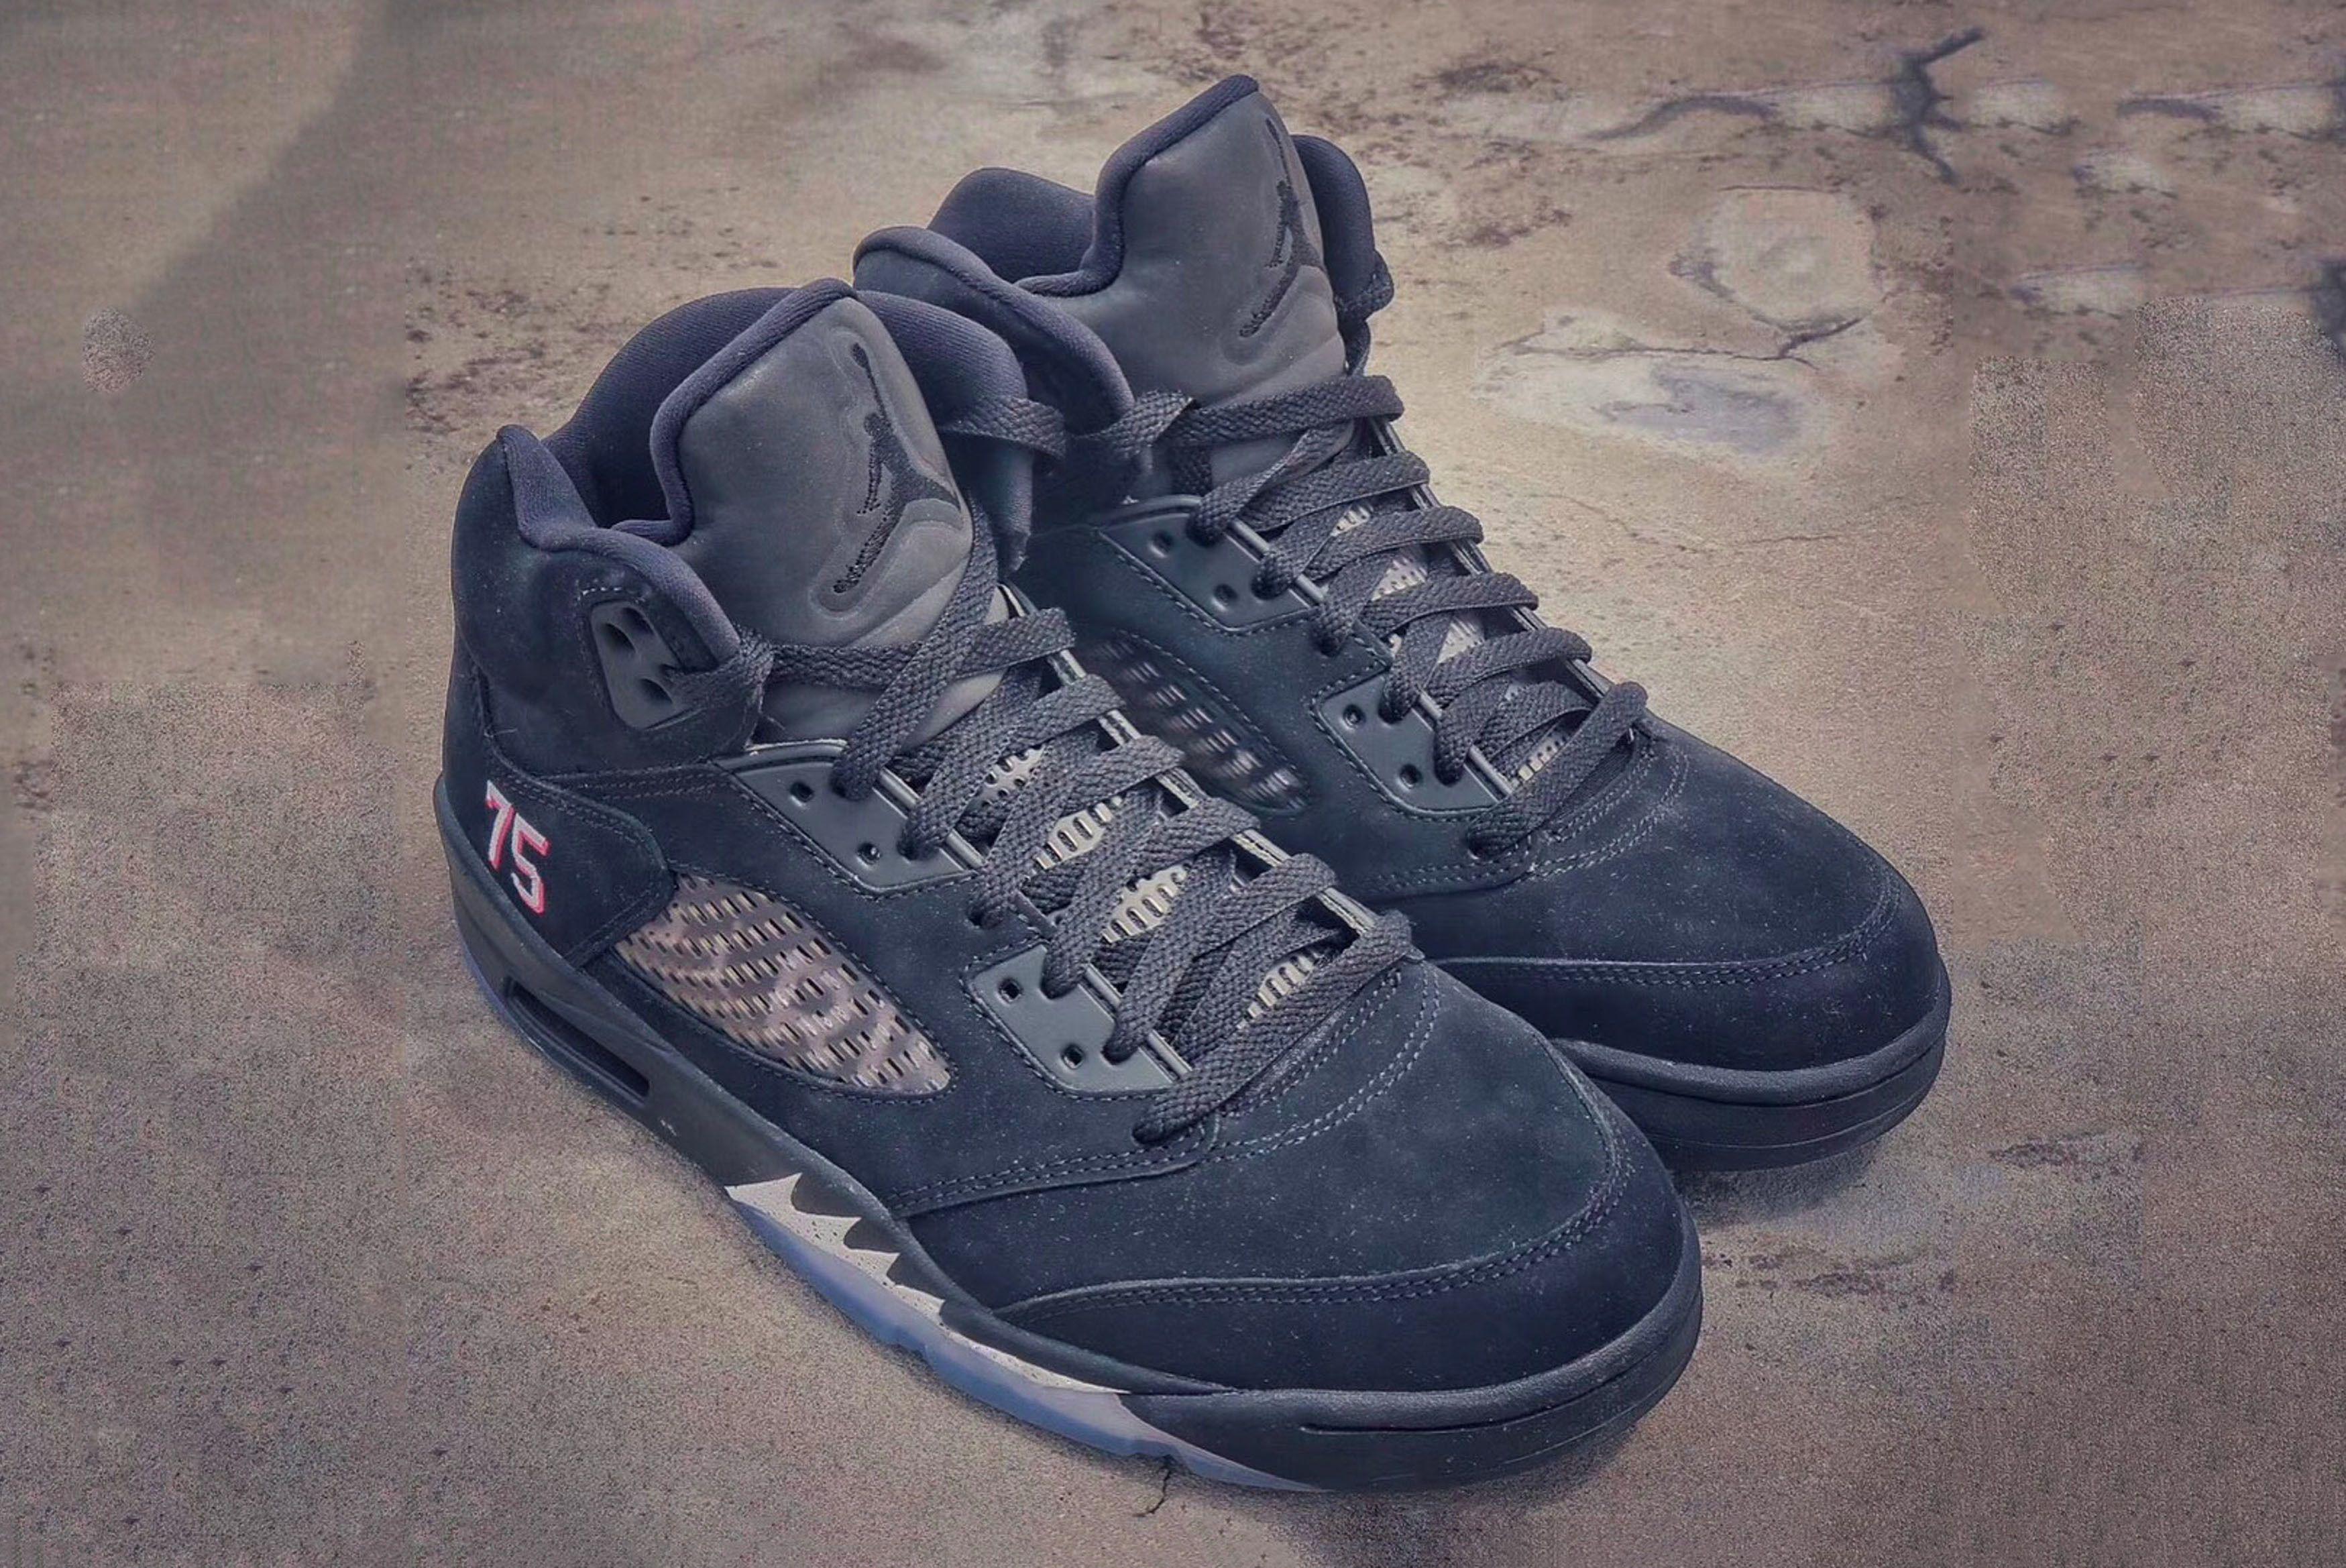 Air Jordan 5 Retro Paris Saint Germain First Look 1 Sneaker Freaker